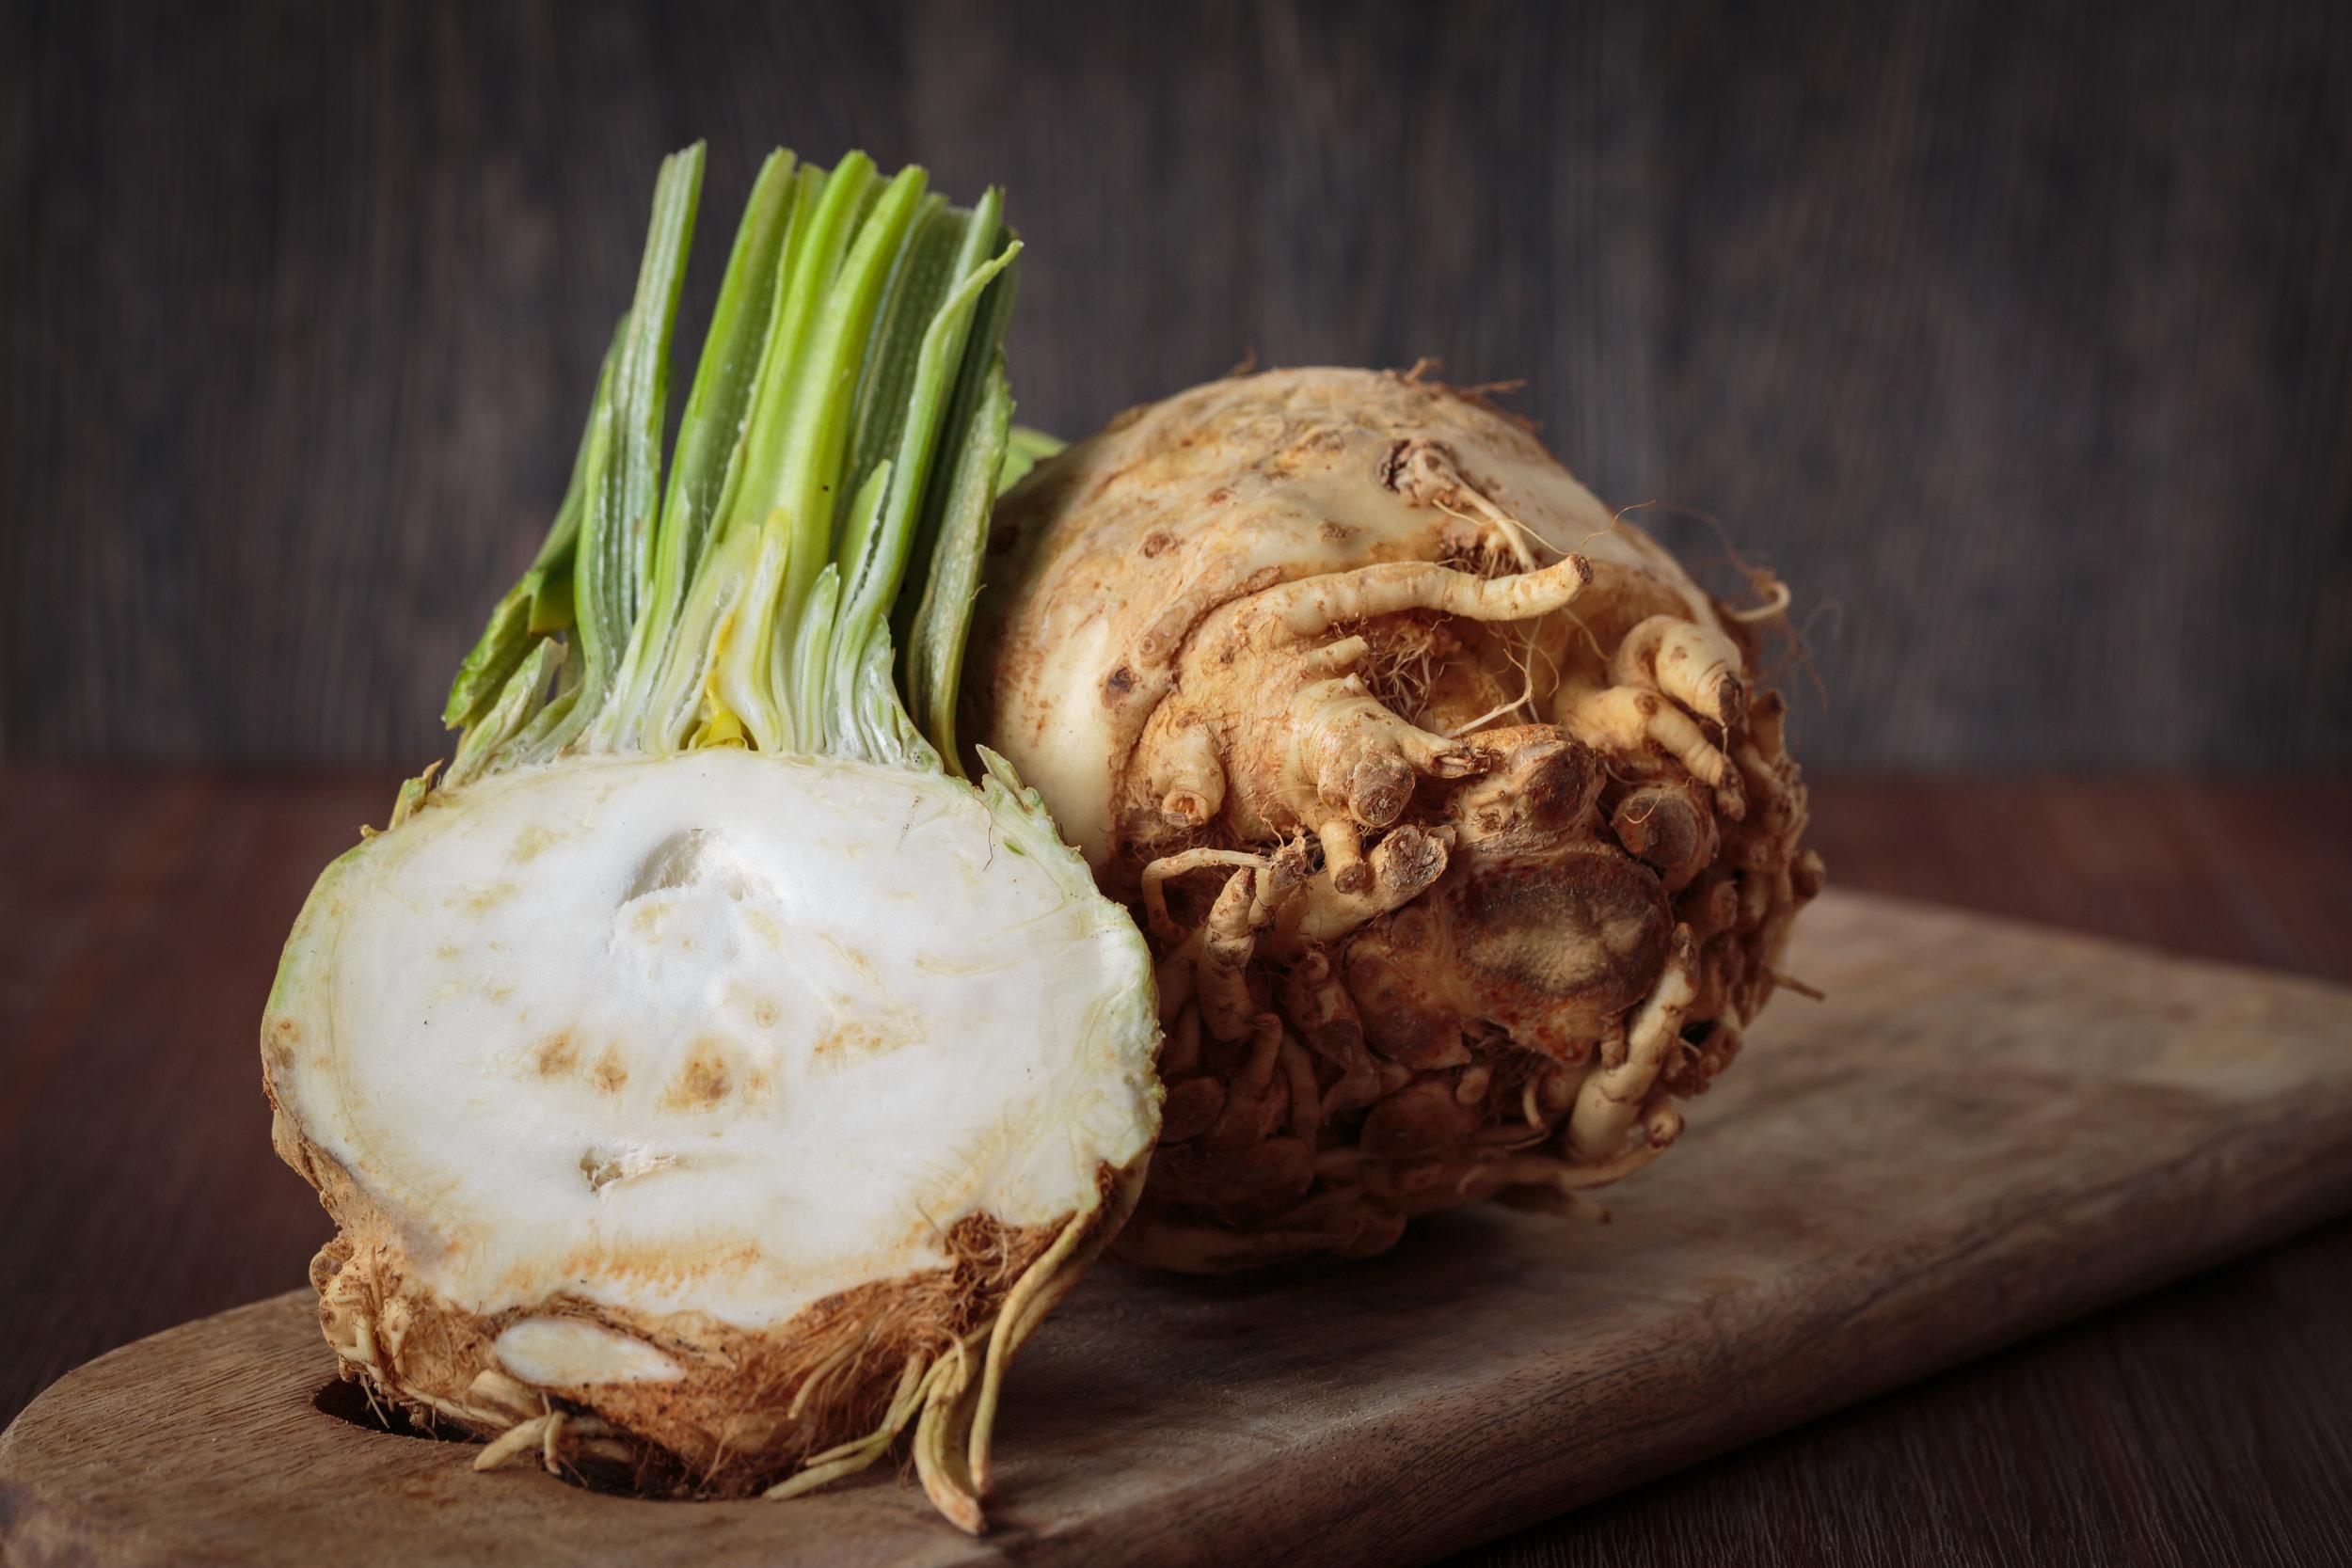 vegan celeriac risotto recipe creamy quick easy and healthy